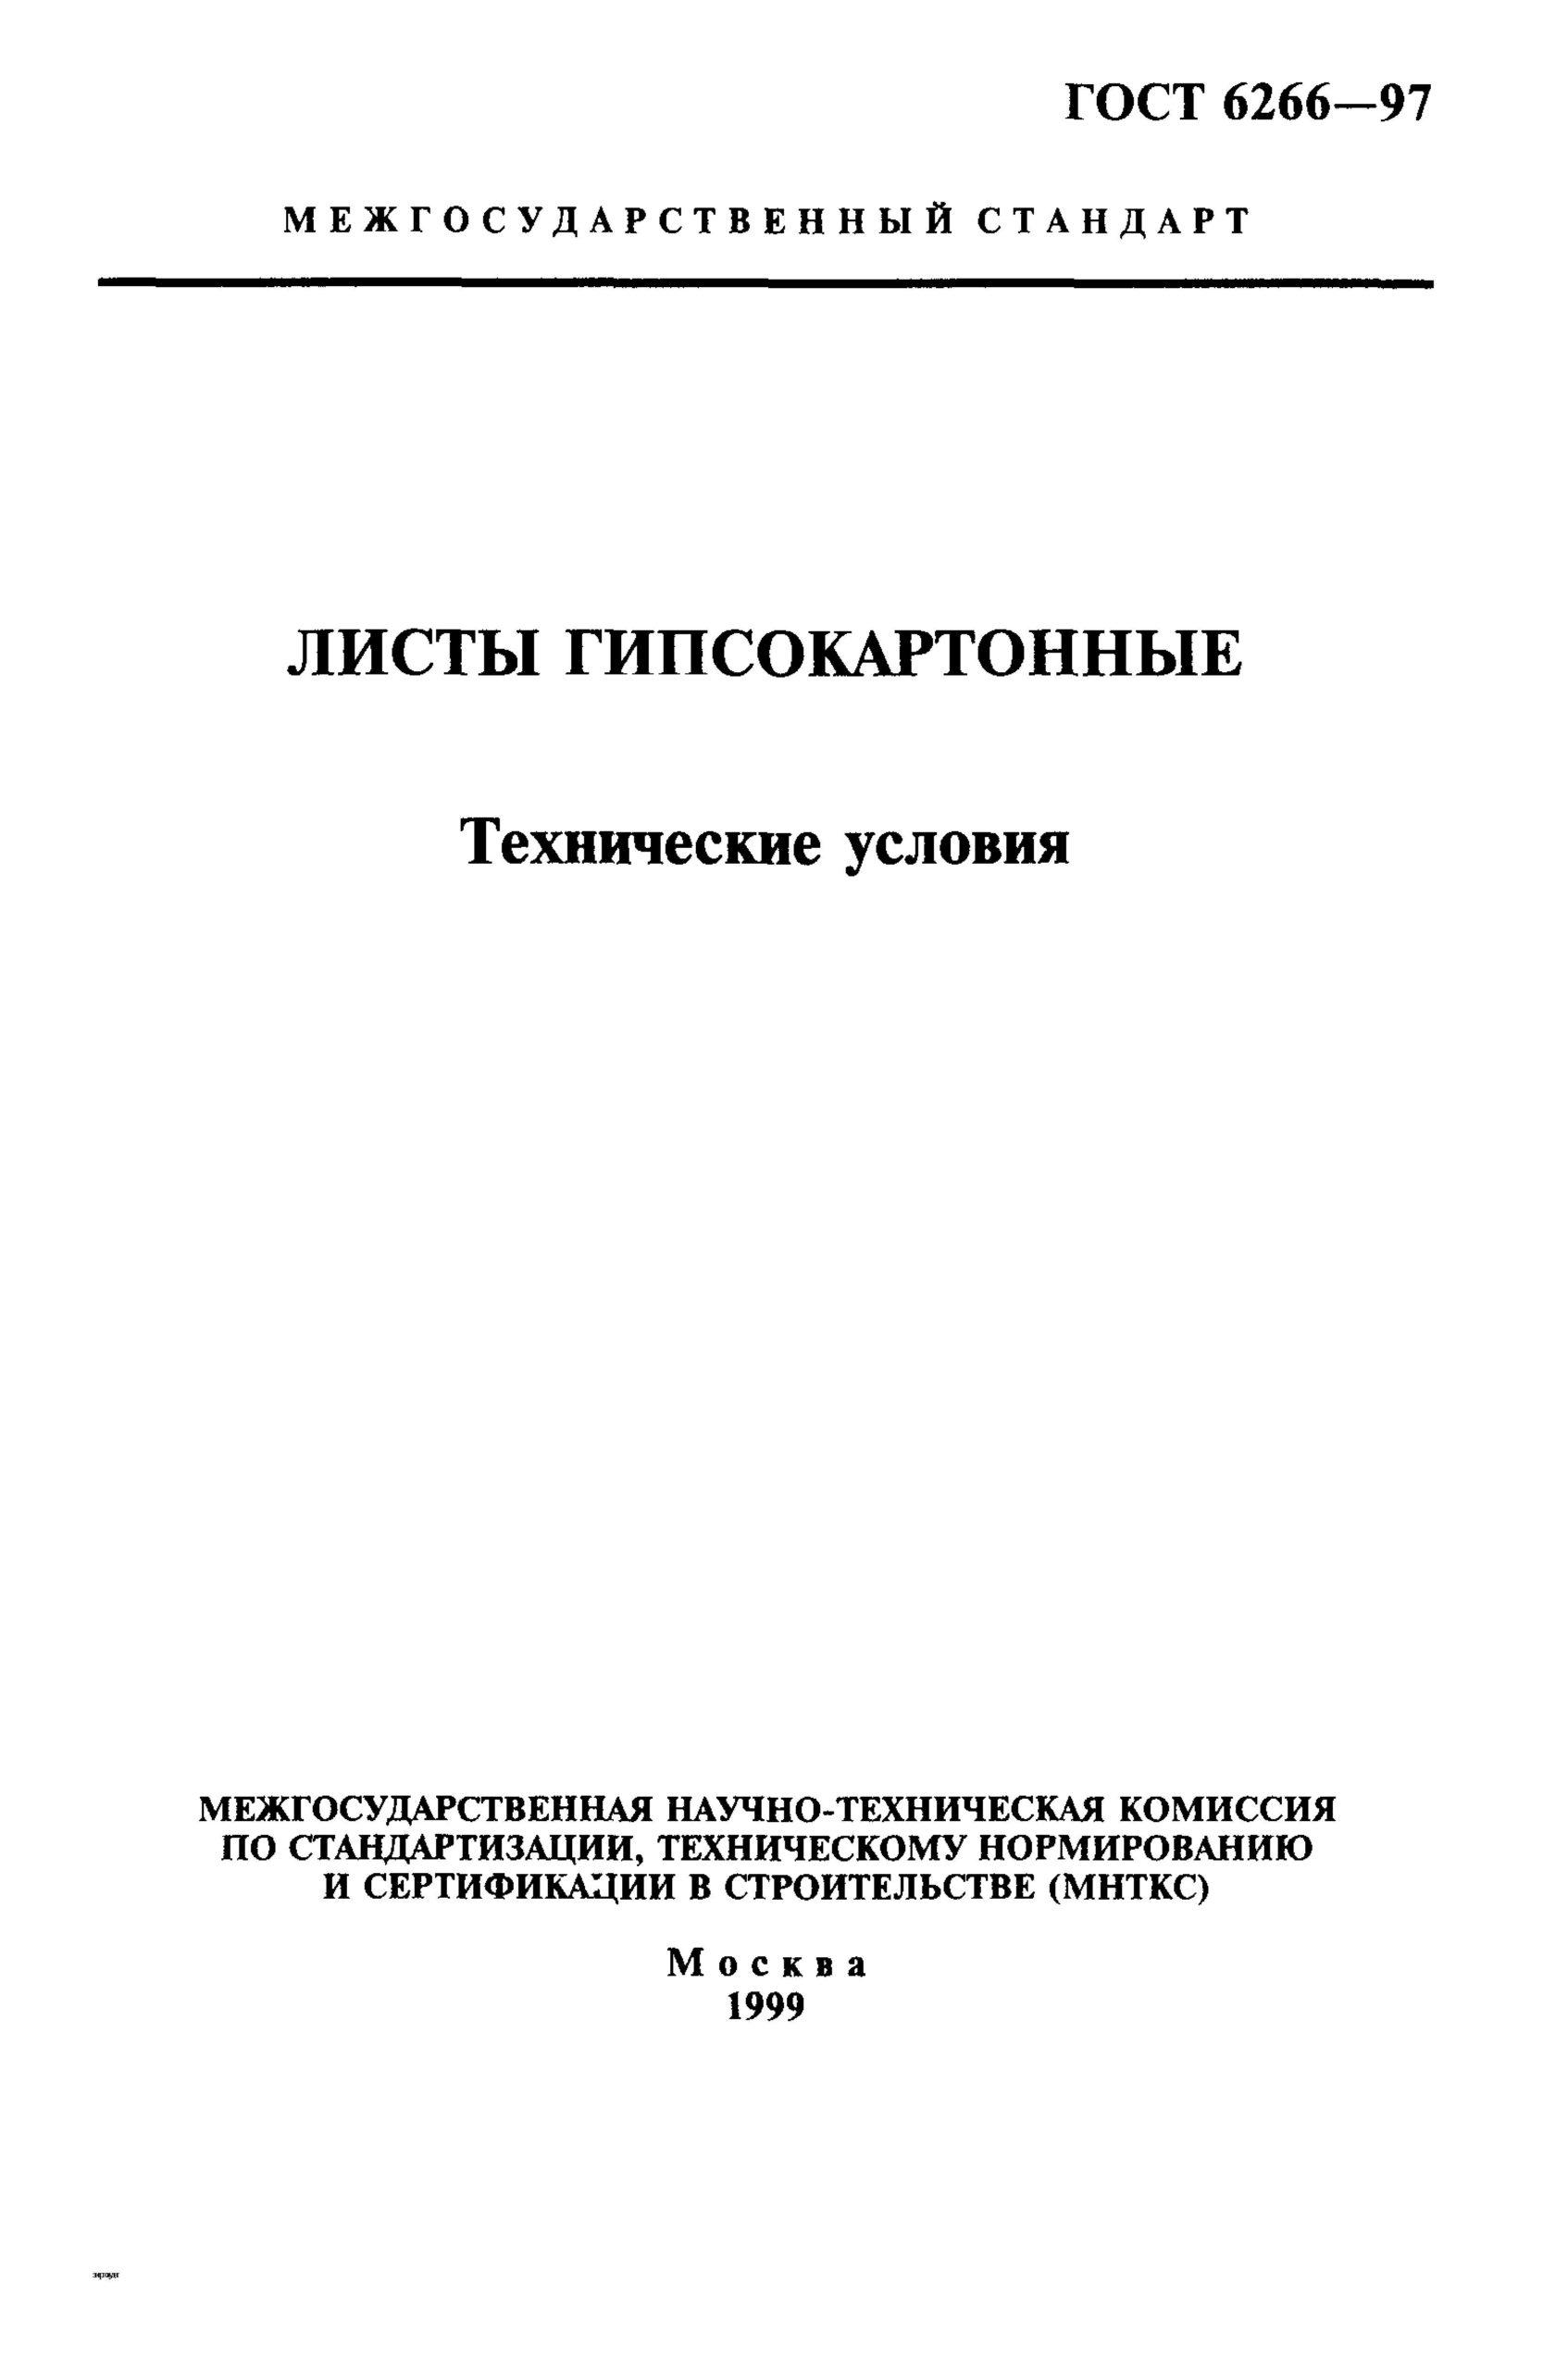 ГОСТ 6266-97